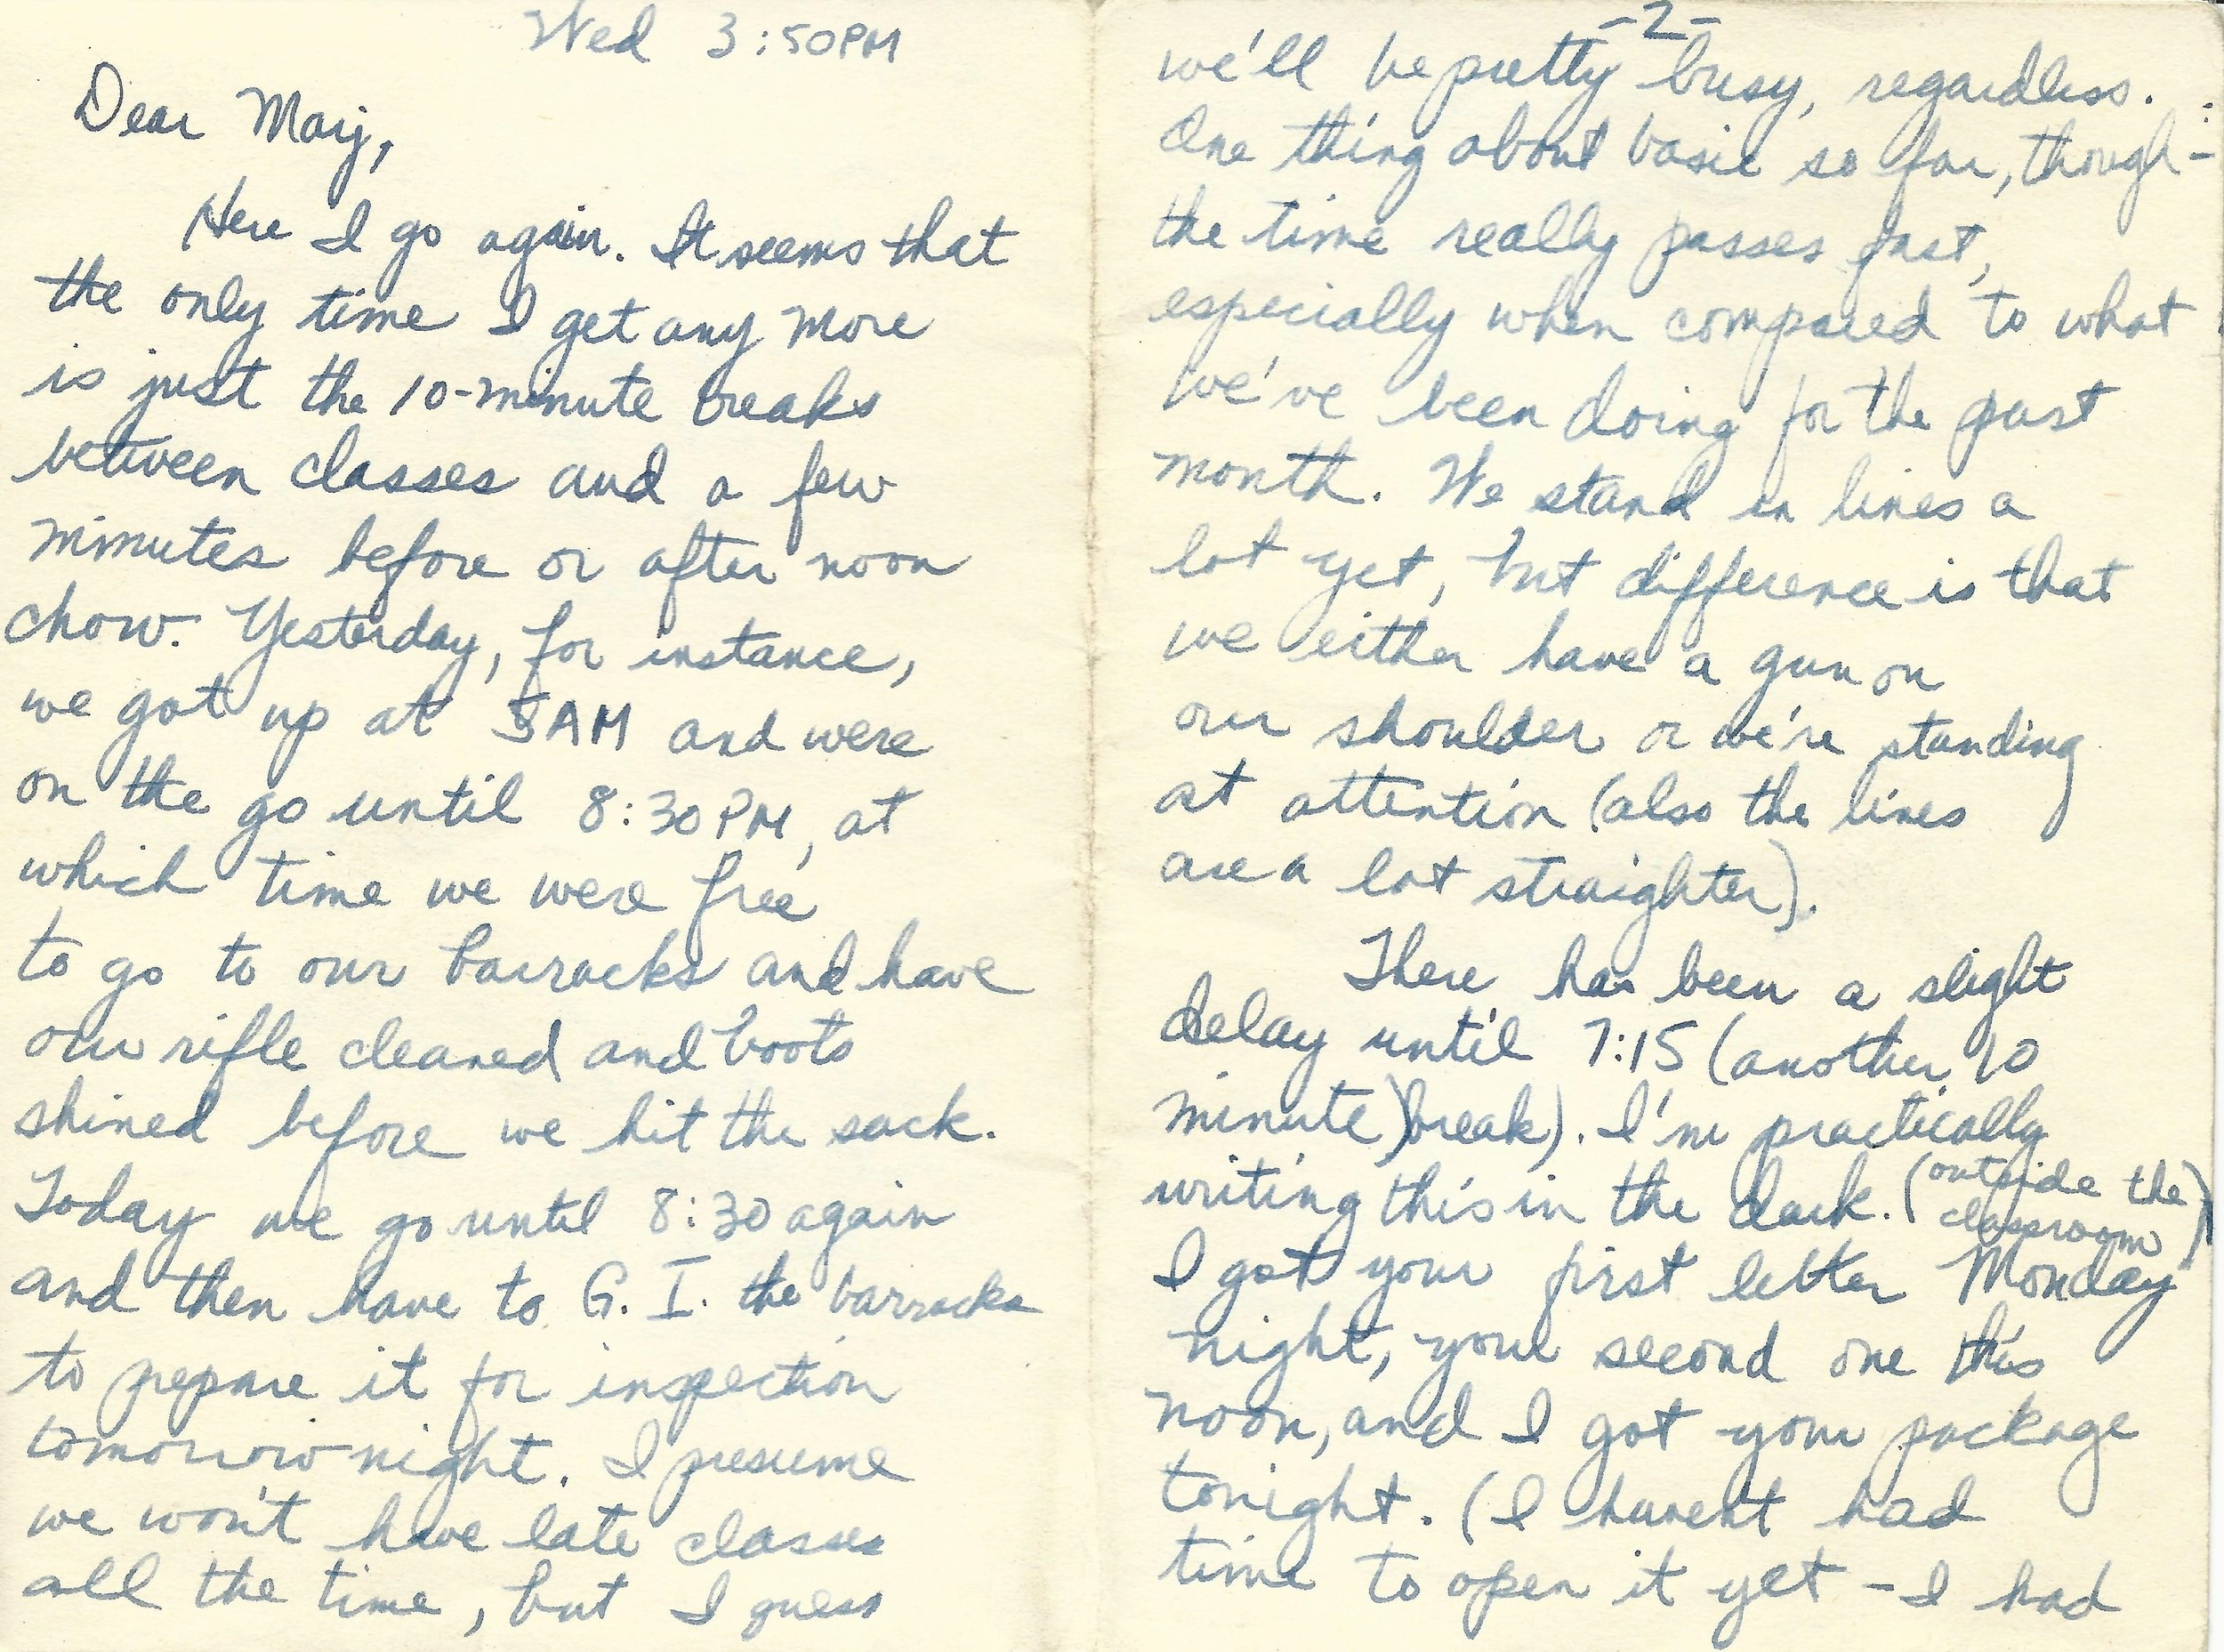 10. Oct. 29, 1952 (Opa)_Page_2.jpg